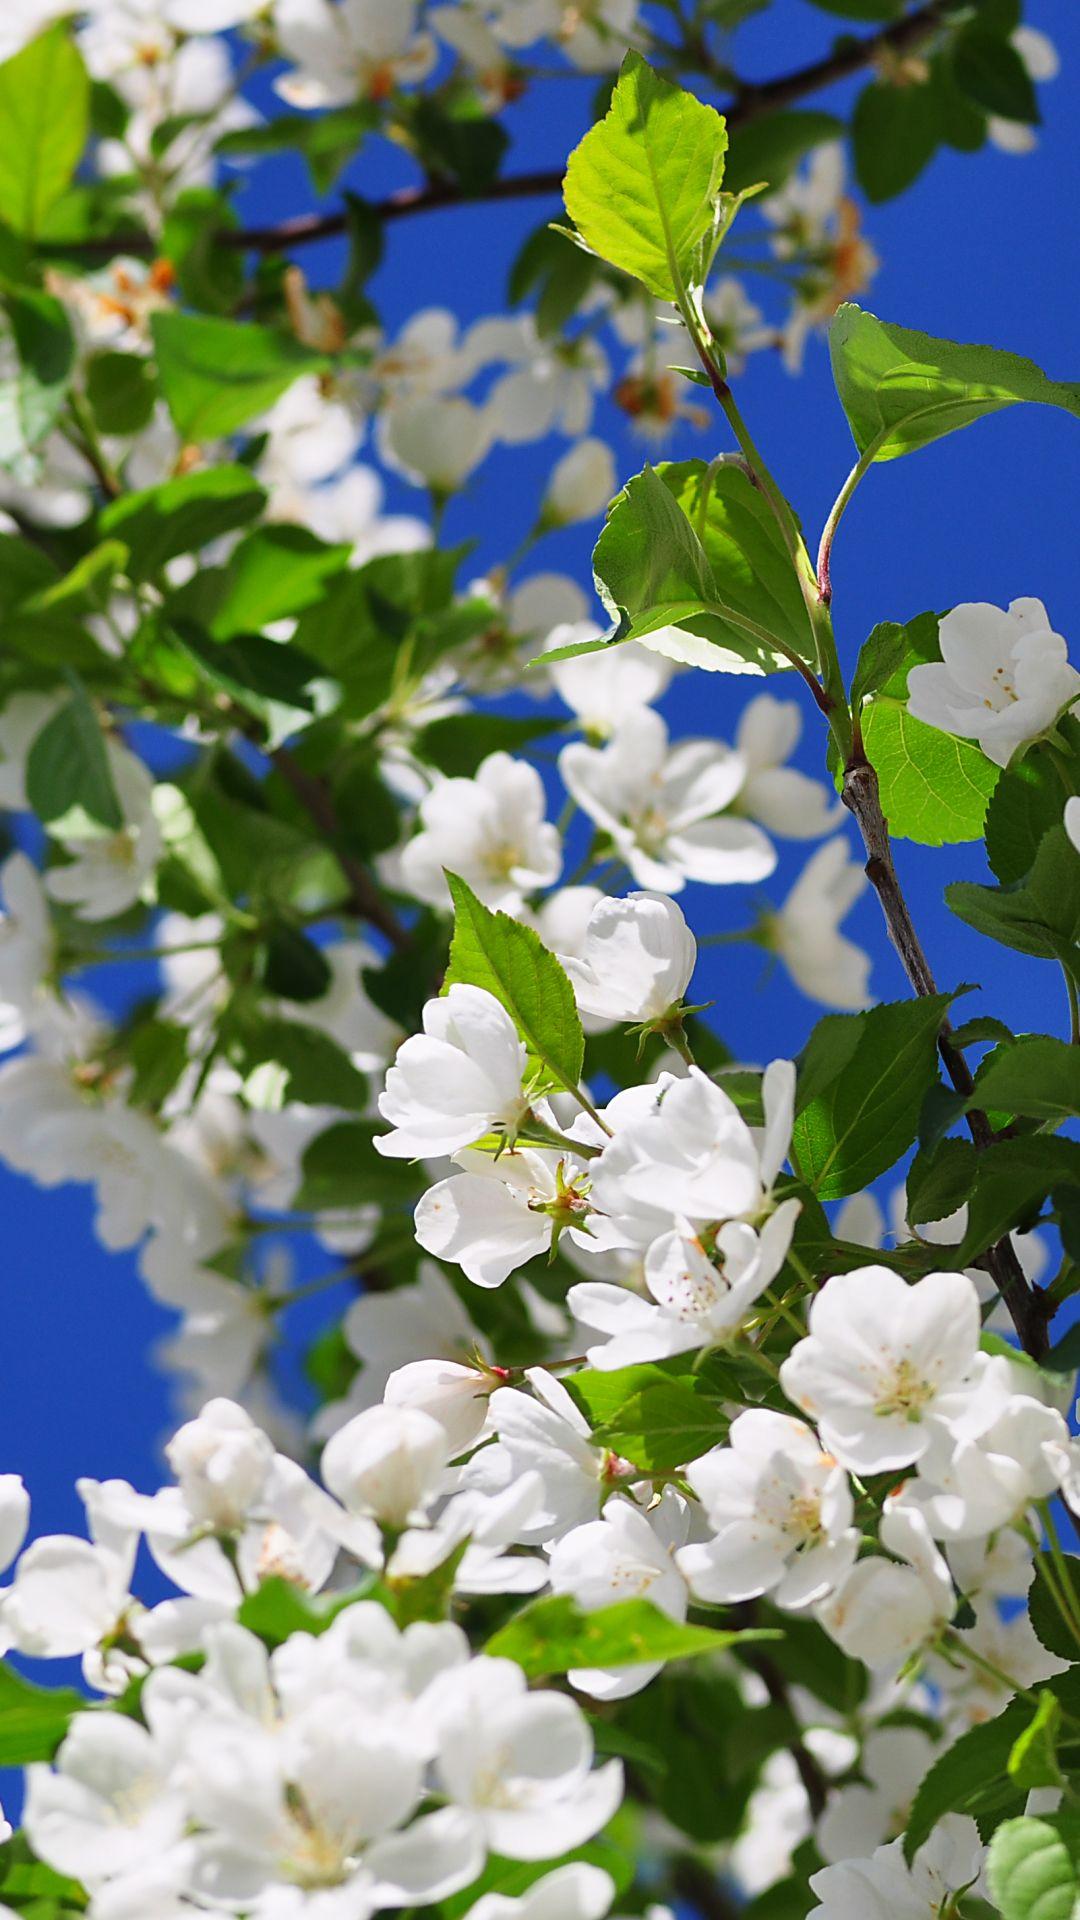 Hd wallpaper flowers pinterest flowers wallpaper and